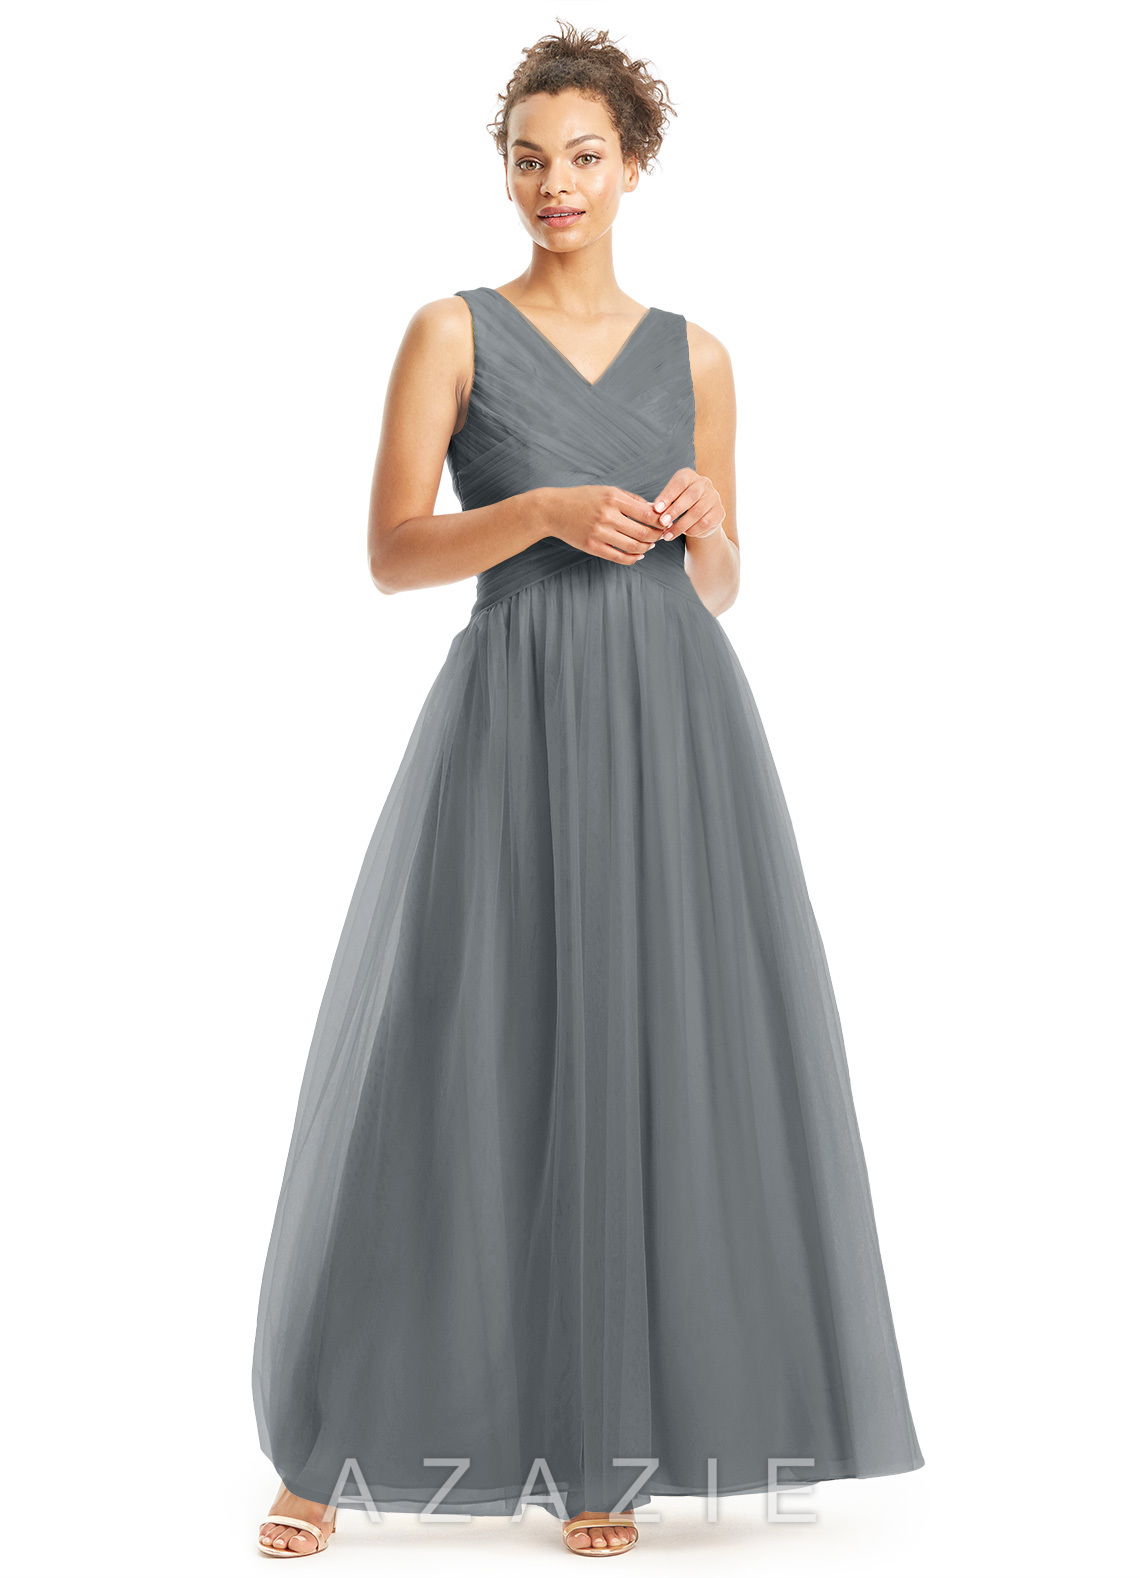 Azazie mag bridesmaid dress azazie loading zoom ombrellifo Choice Image